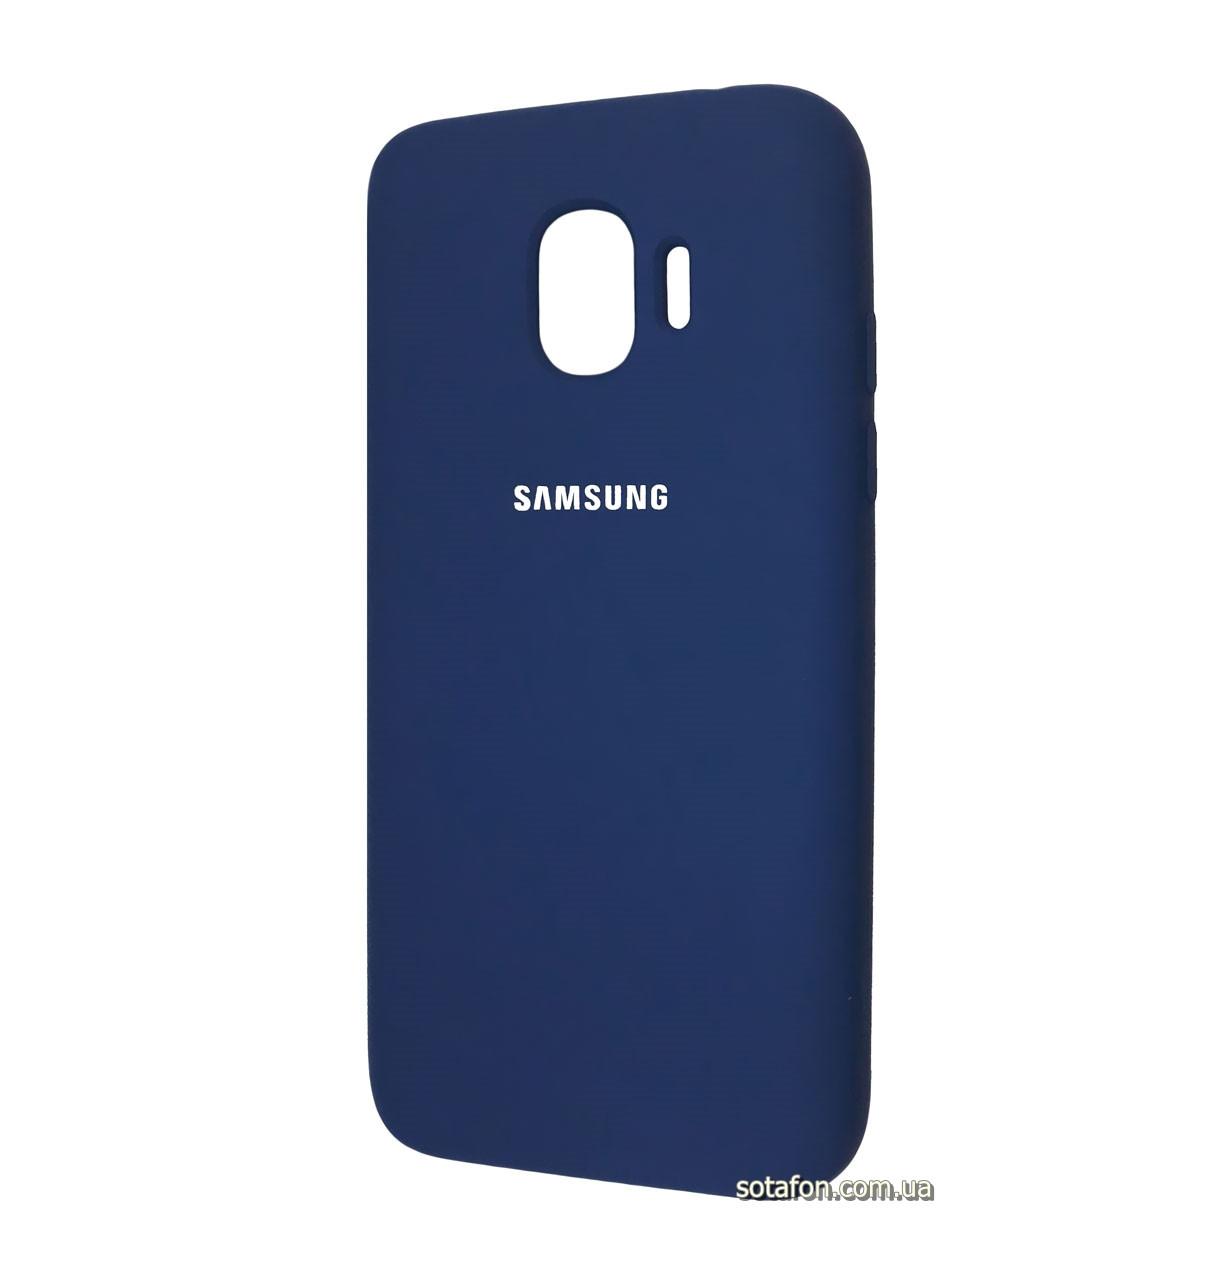 Чехол накладка Original Silicone case на Samsung Galaxy J2 (2018) SM-J250F Dark Blue